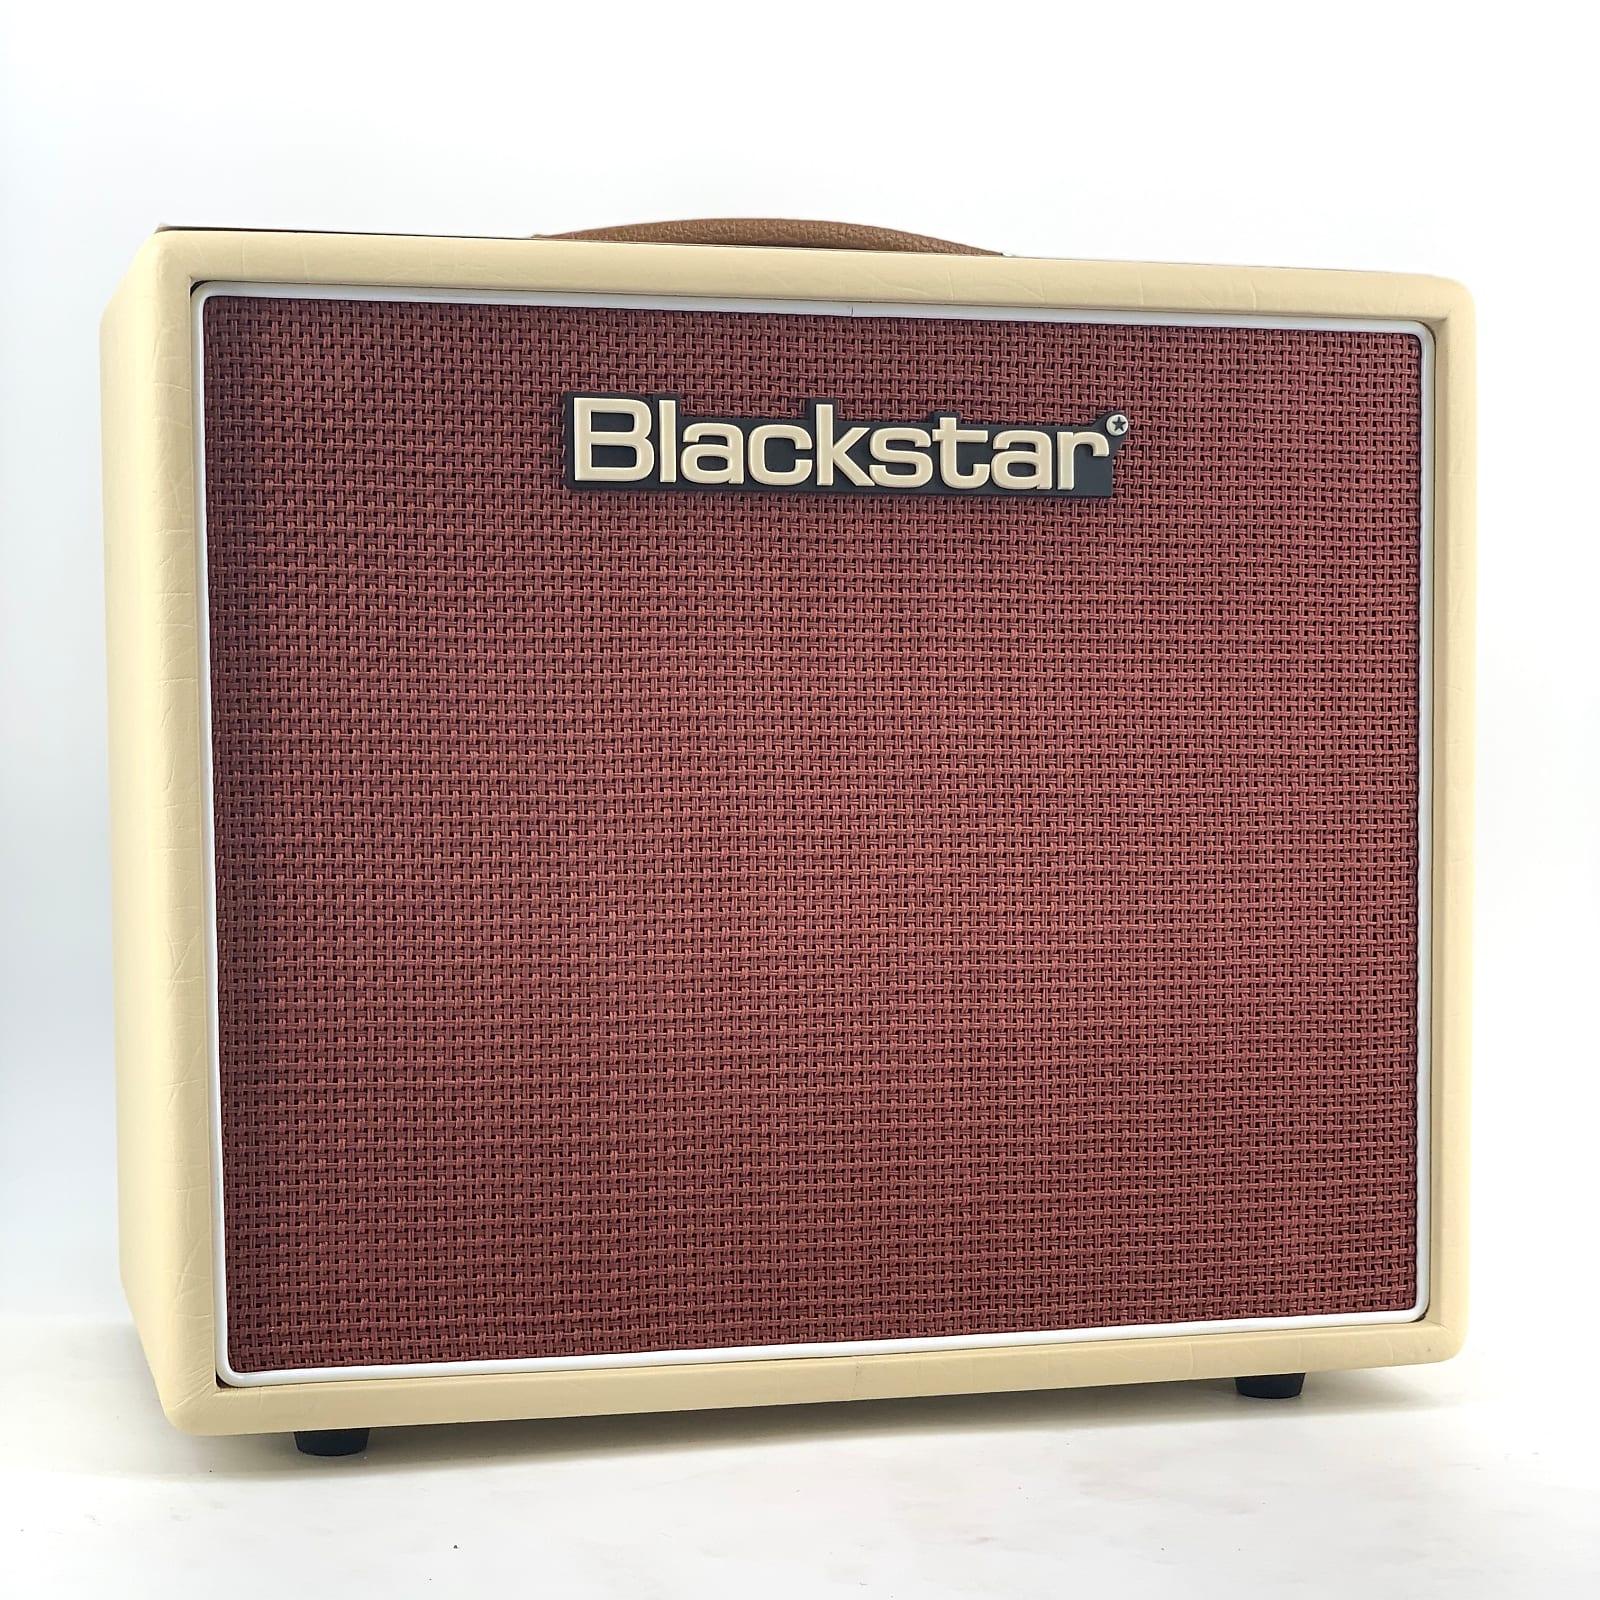 Blackstar Studio 10 6L6 1x12 Tube Combo - Brand New - Free Shipping!